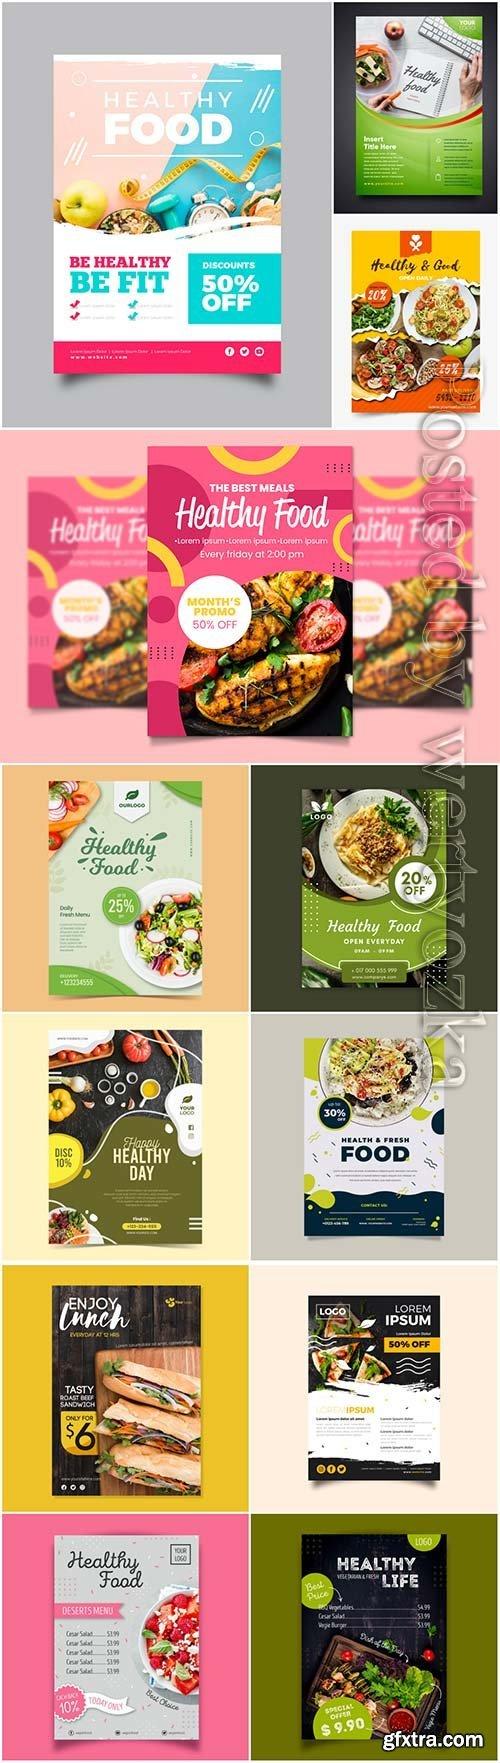 Healthy food flyers in vector